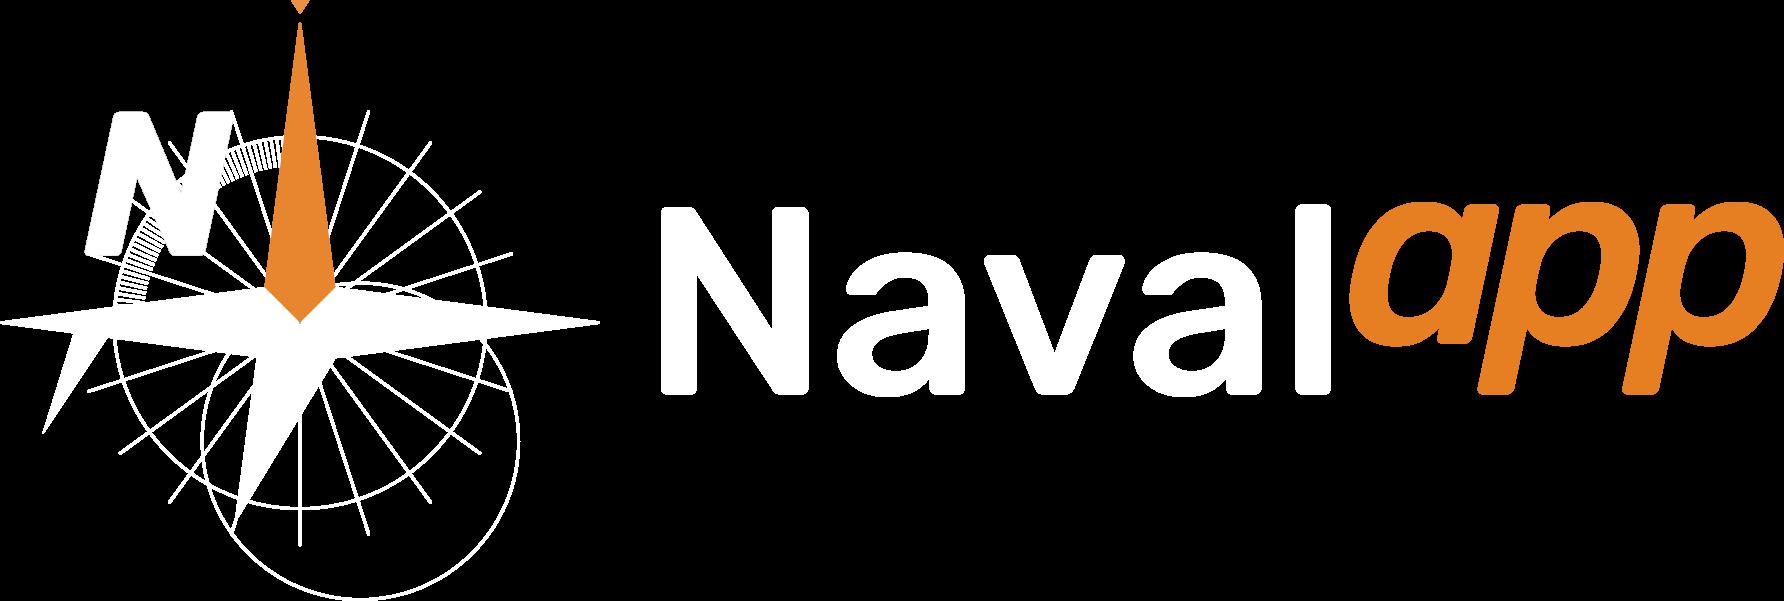 Navalapp. Sailing Yachts Design & Performance